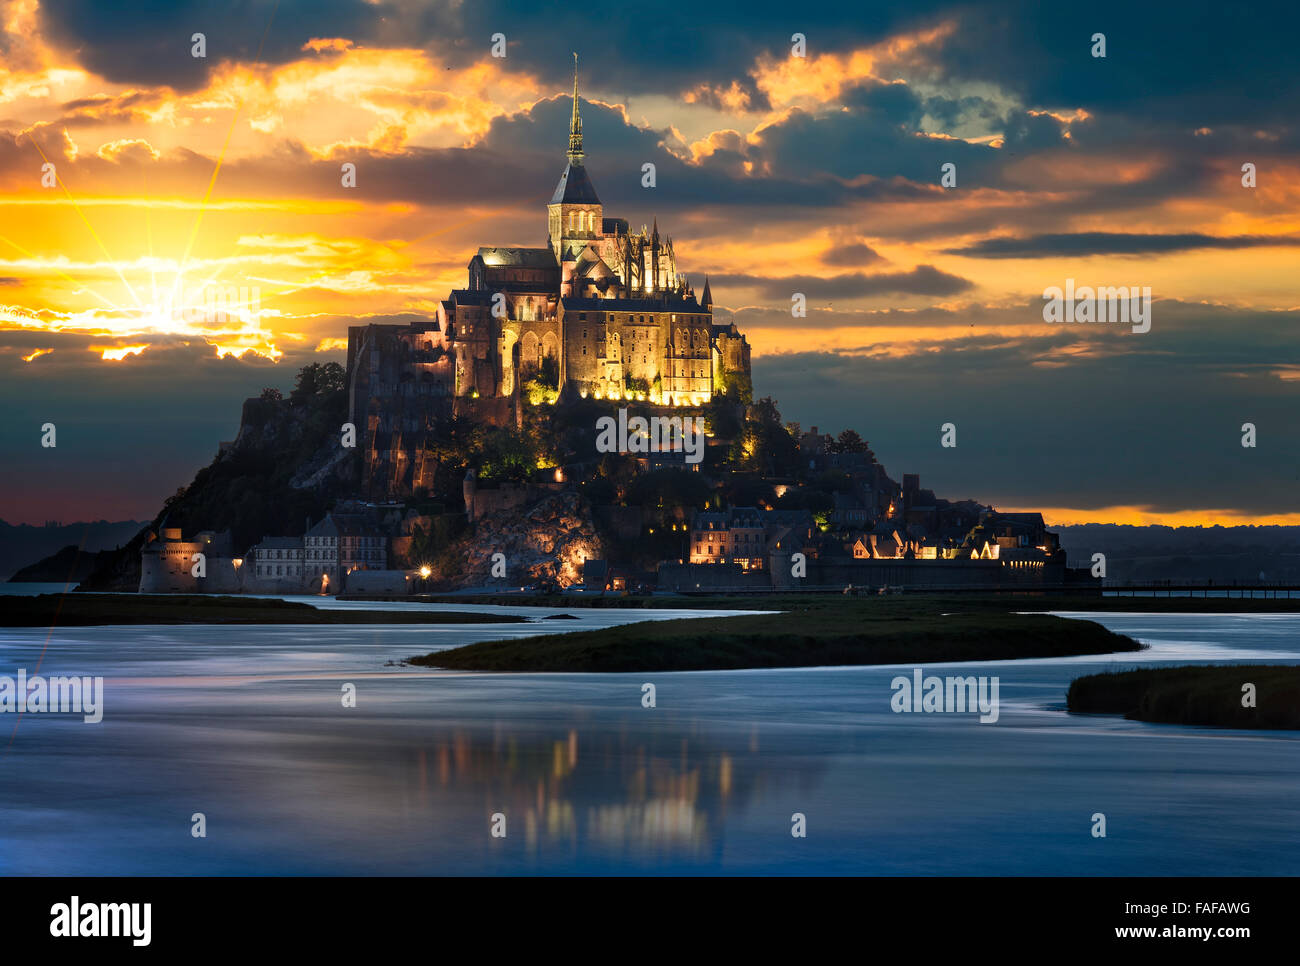 Le Mont-Saint-Michel at sunset, Normandie, Bretagne, France, Europe - Stock Image